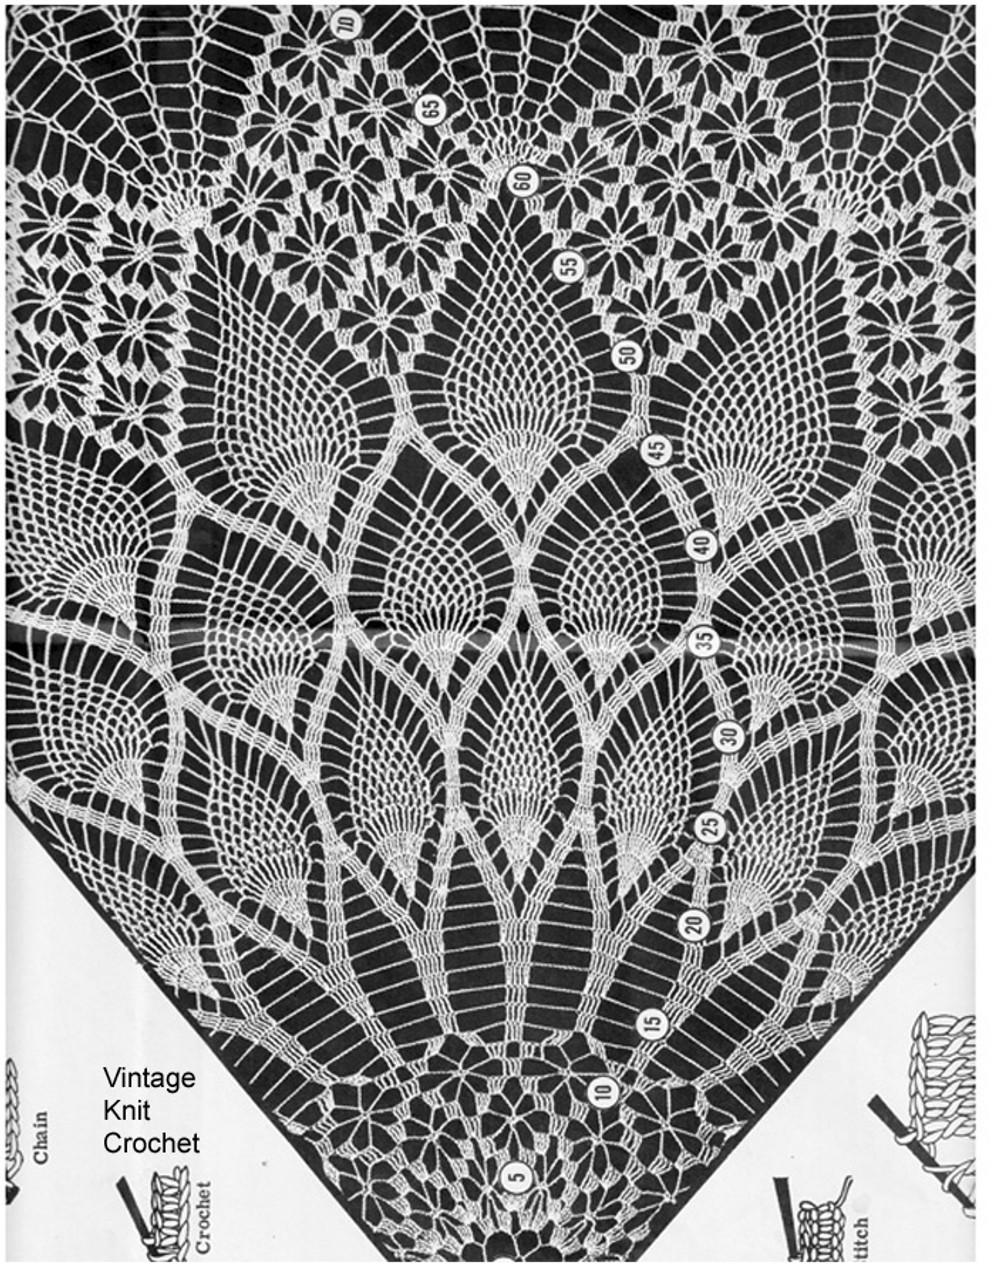 Pattern stitch illustration, Laura wheeler 684 pineapple cloth